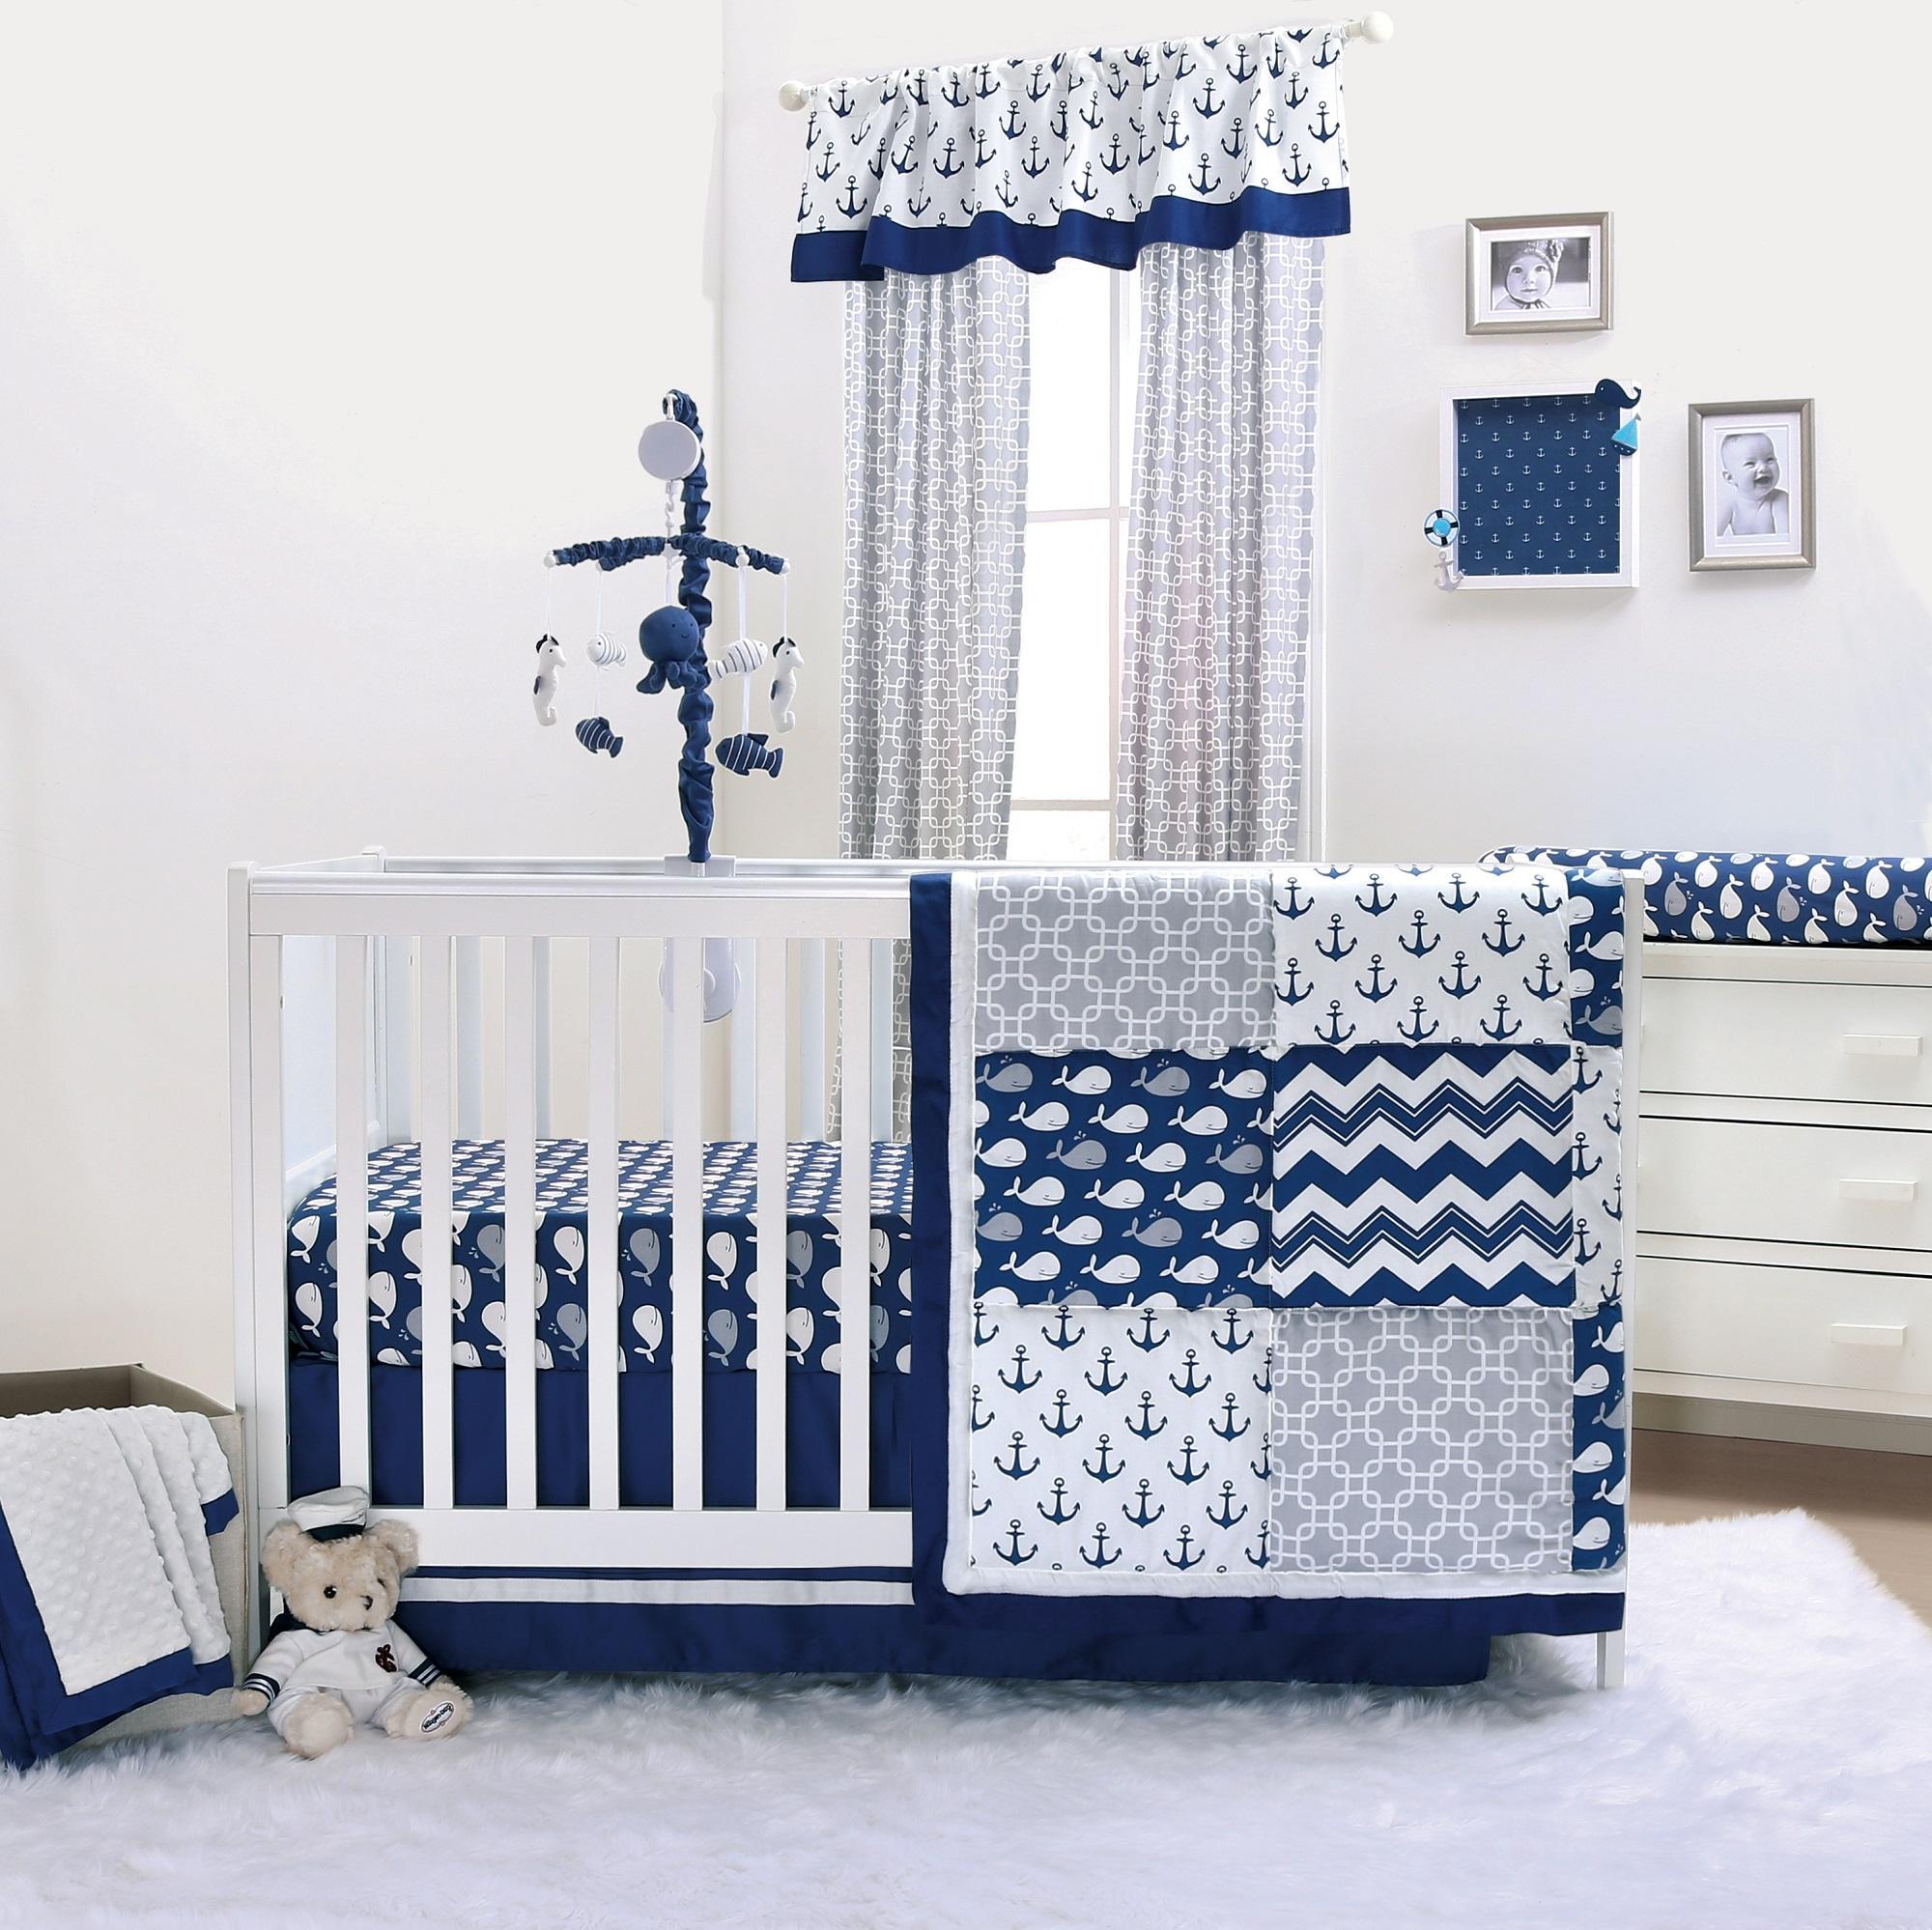 Navy Whale Crib Bedding Set